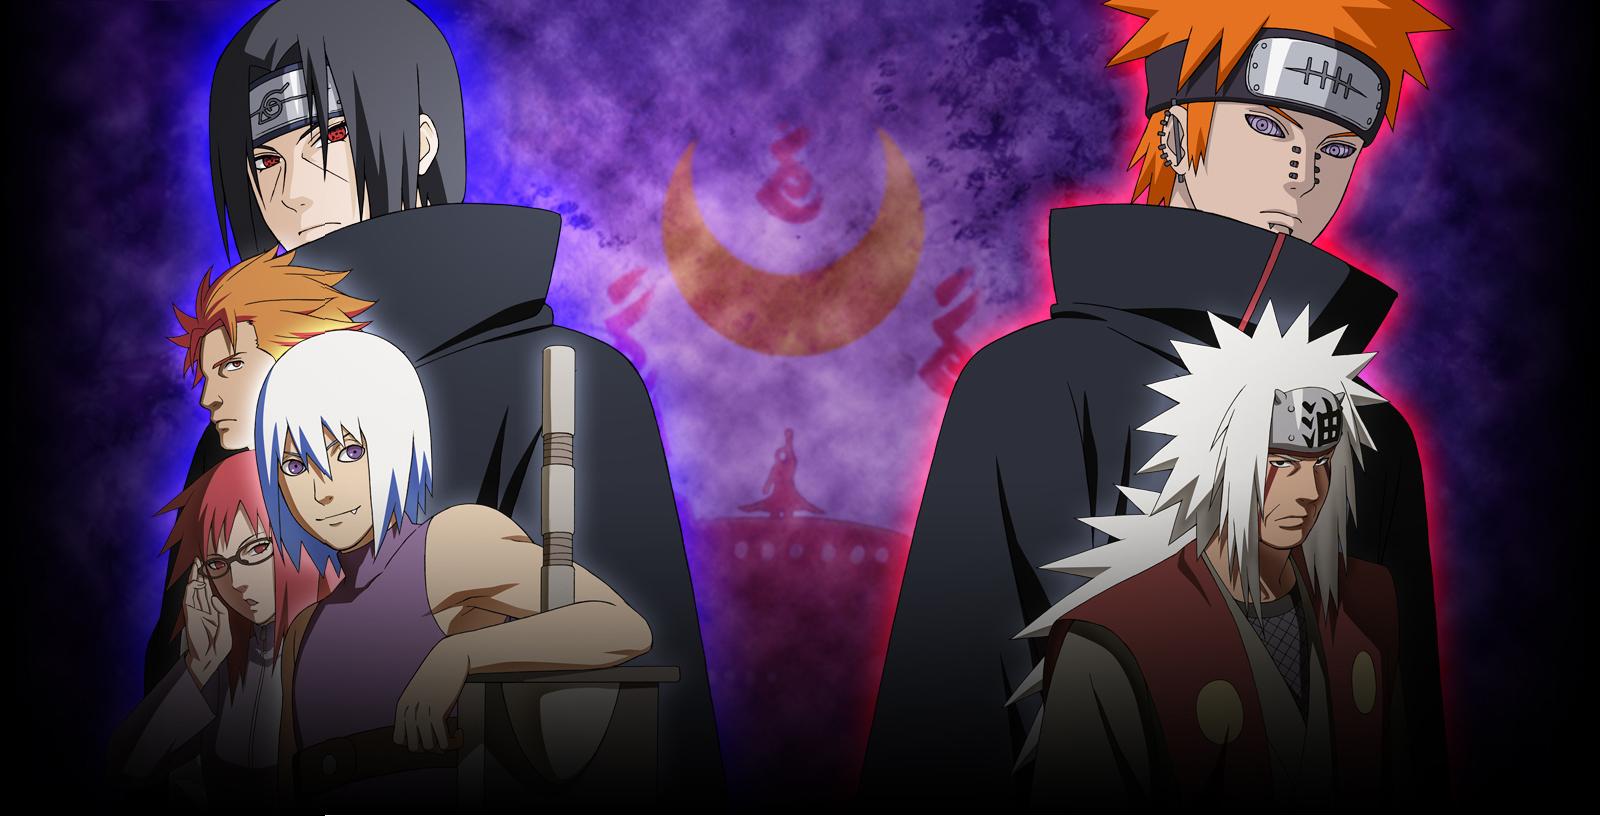 Naruto Shippuden Wallpaper Celular: Wallpapers Naruto Shippuden Y Naruto